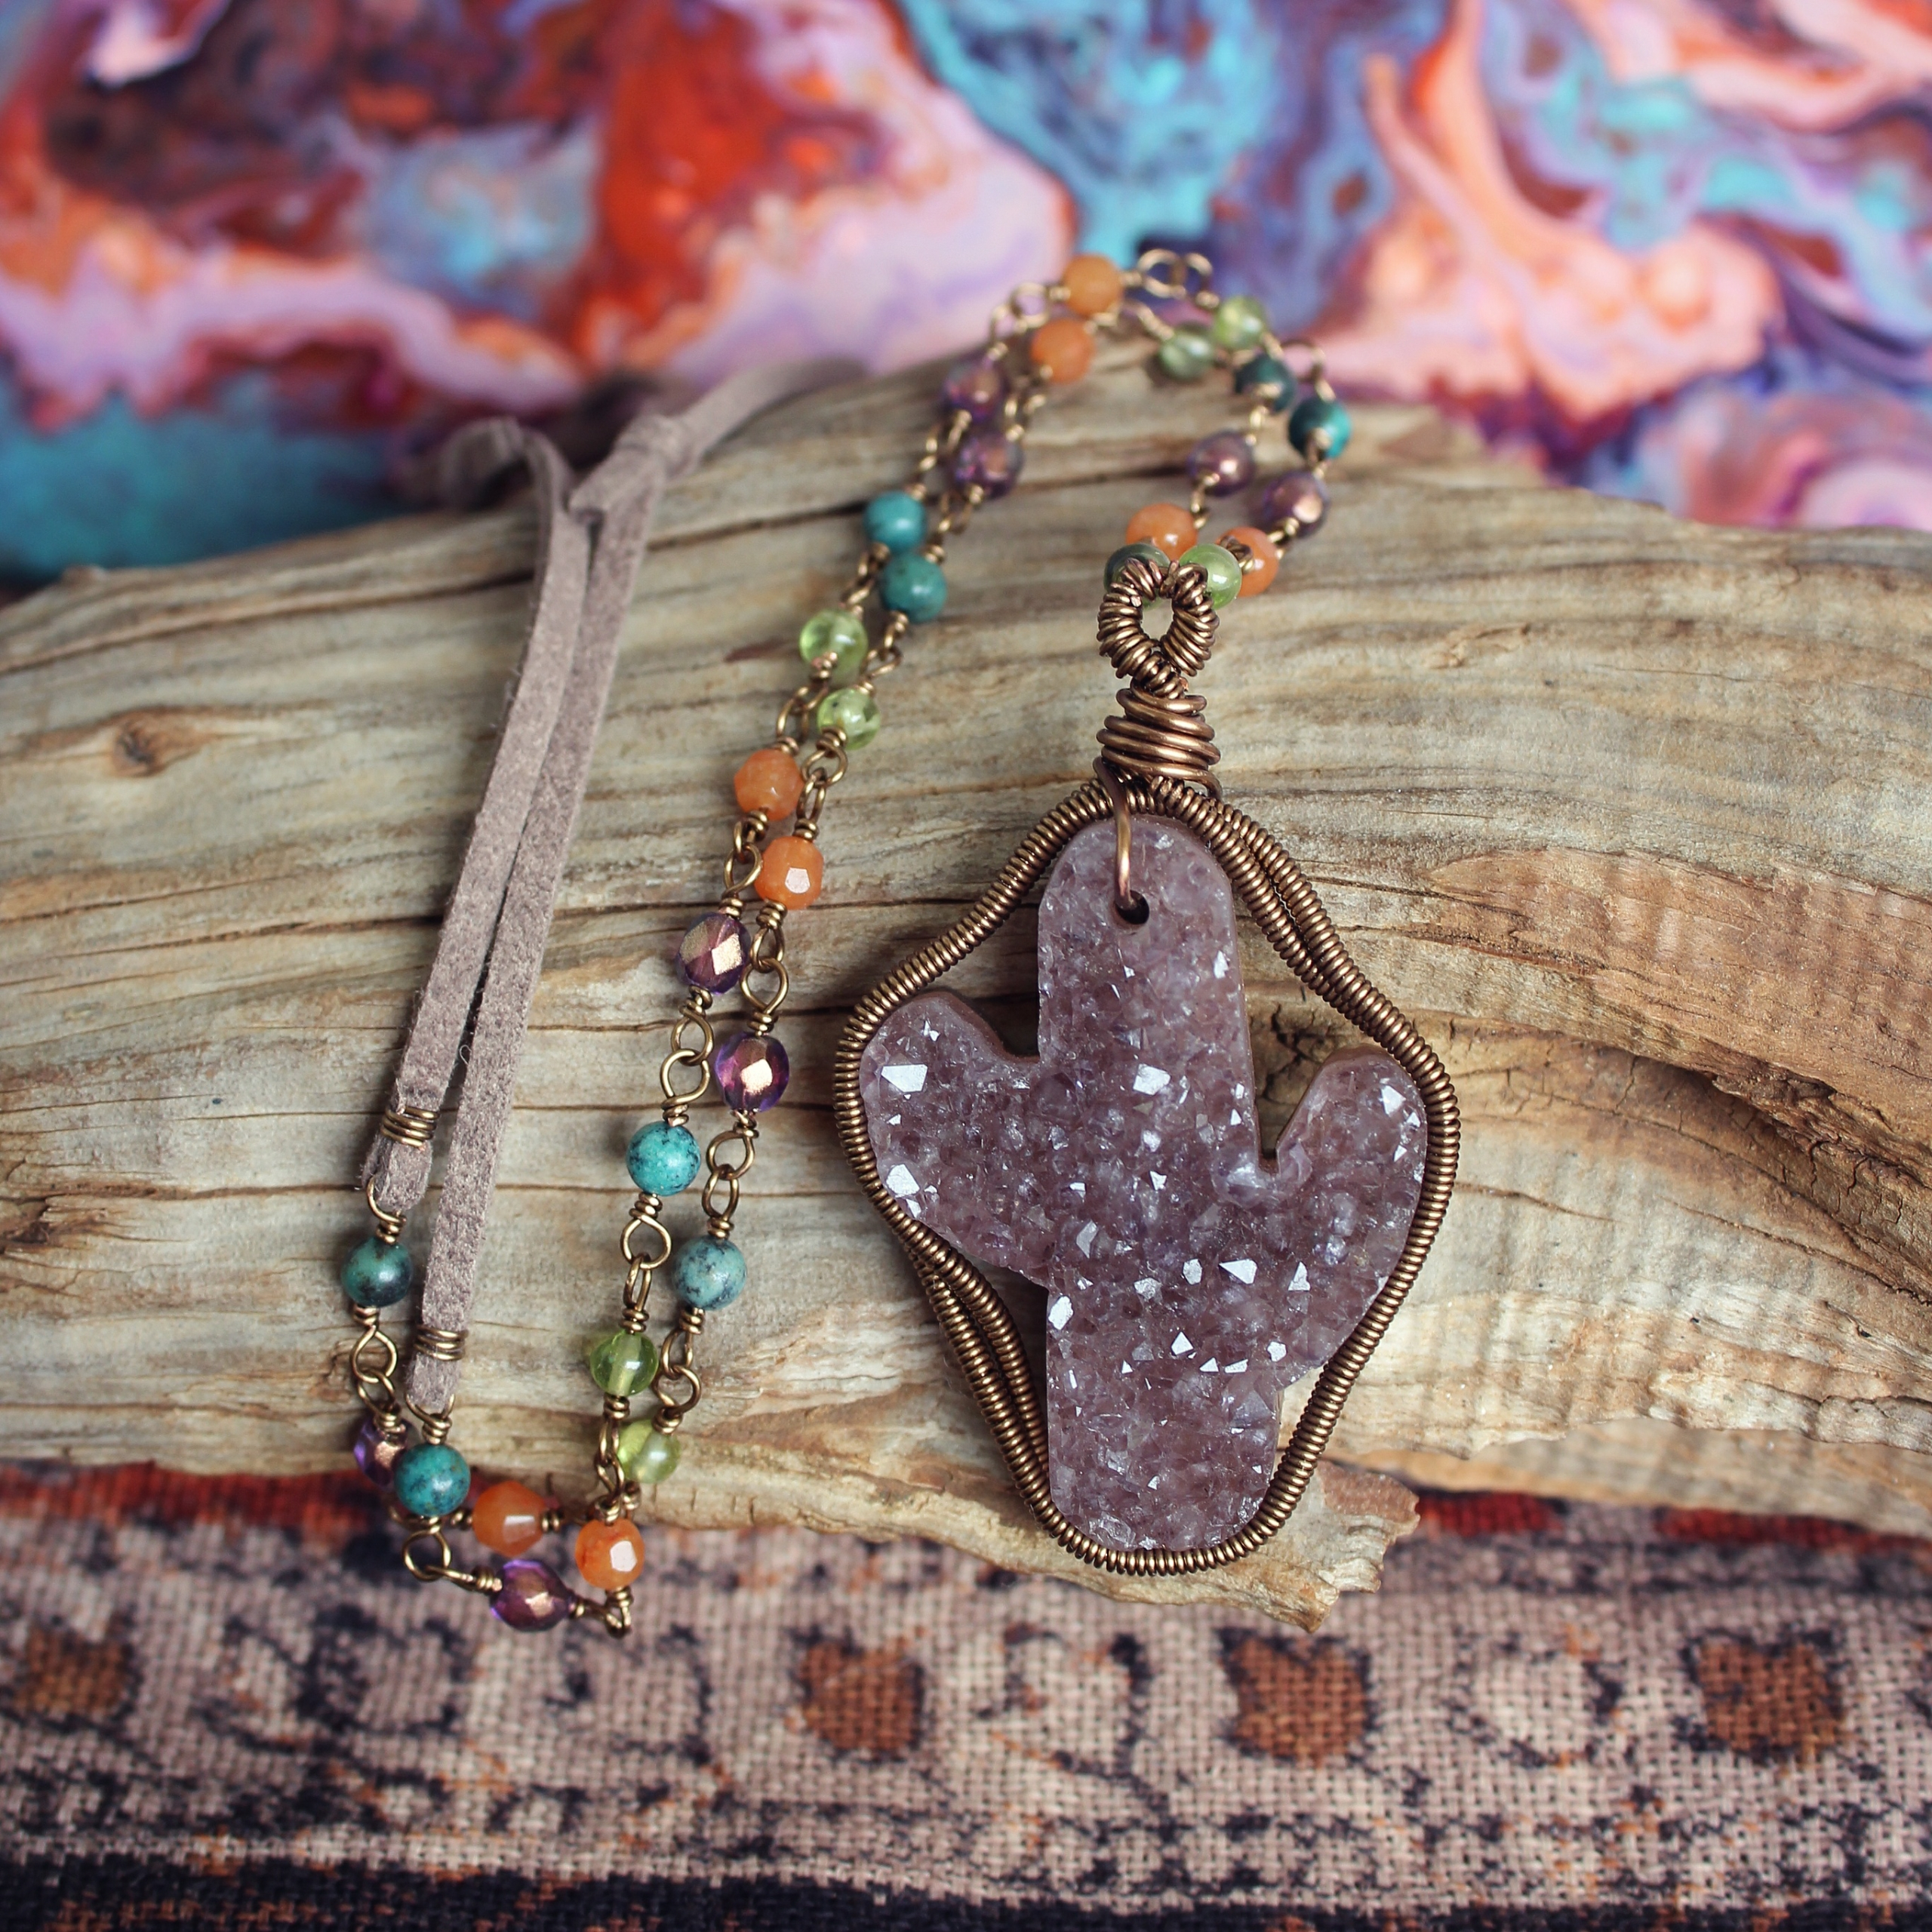 love necklace turned beauty fea - moongoddessvibes | ello